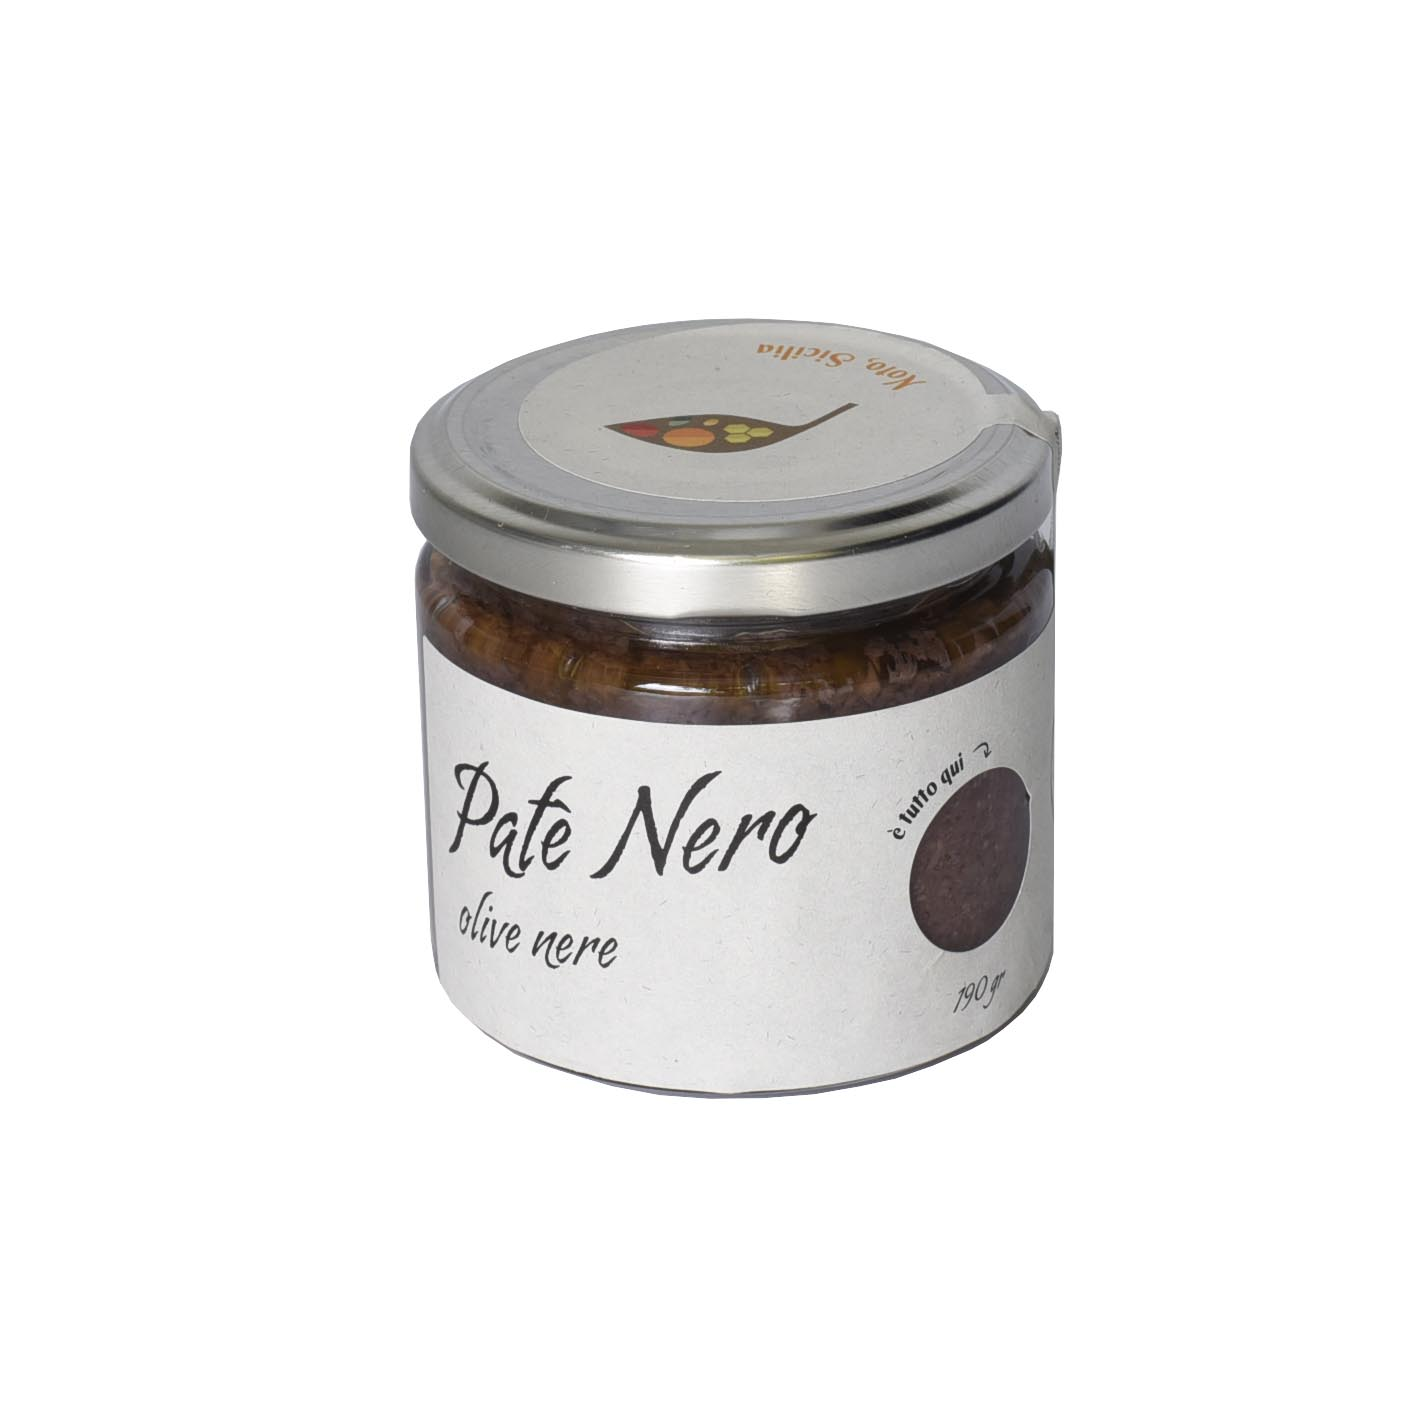 Patè nero di olive nere 190 gr